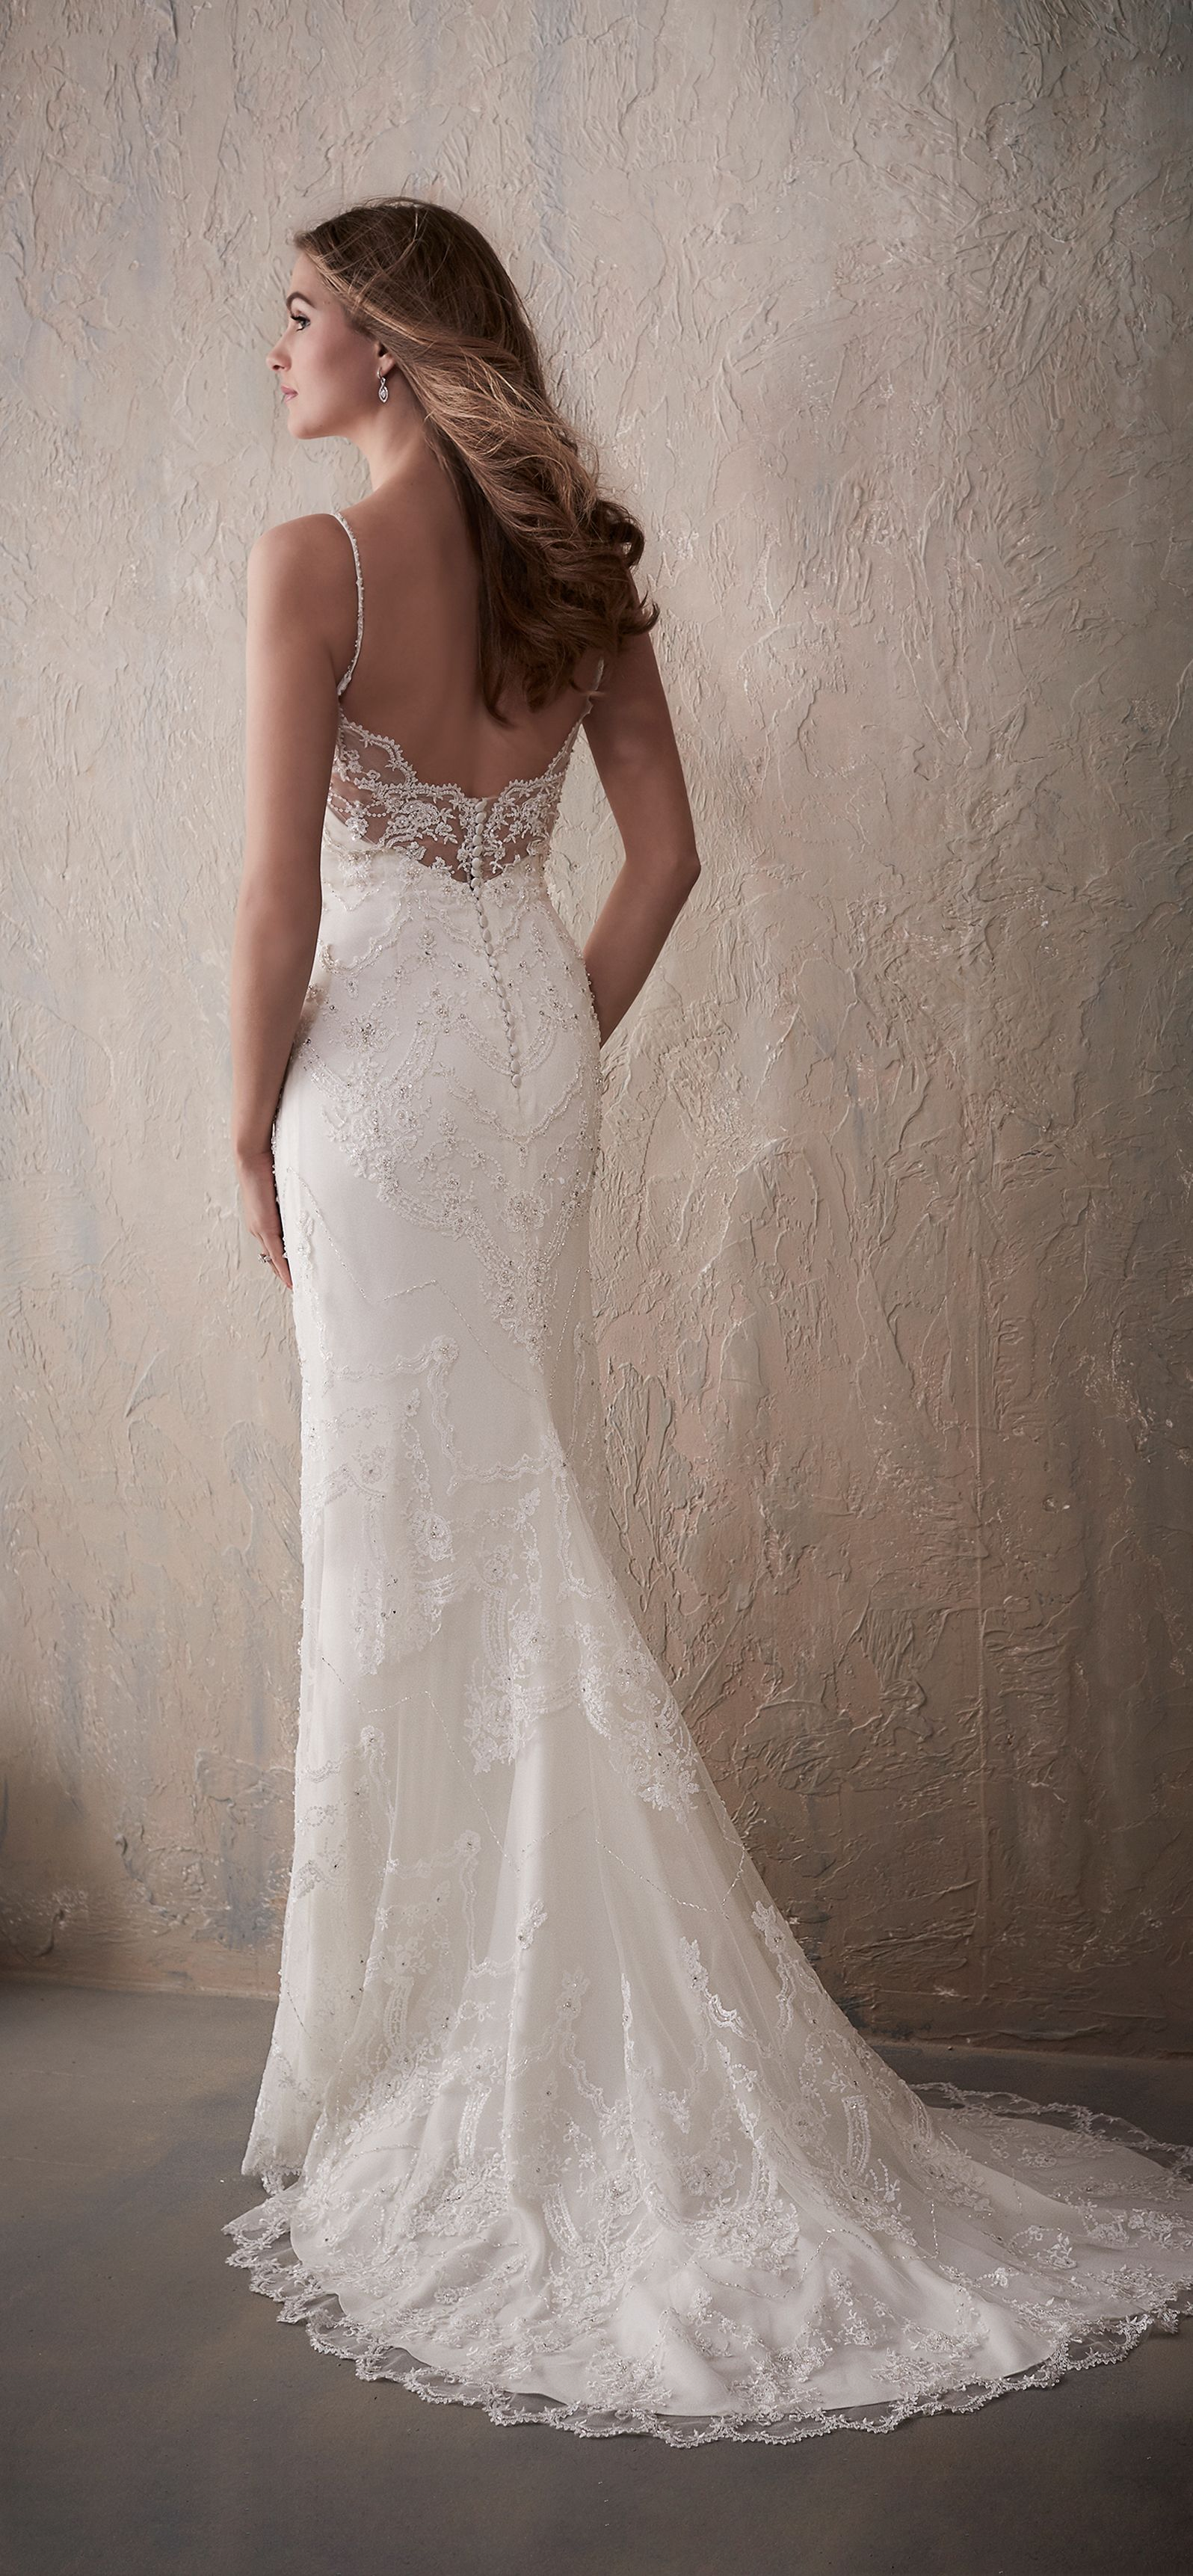 Backless spaghetti strap sheath wedding dress with beaded